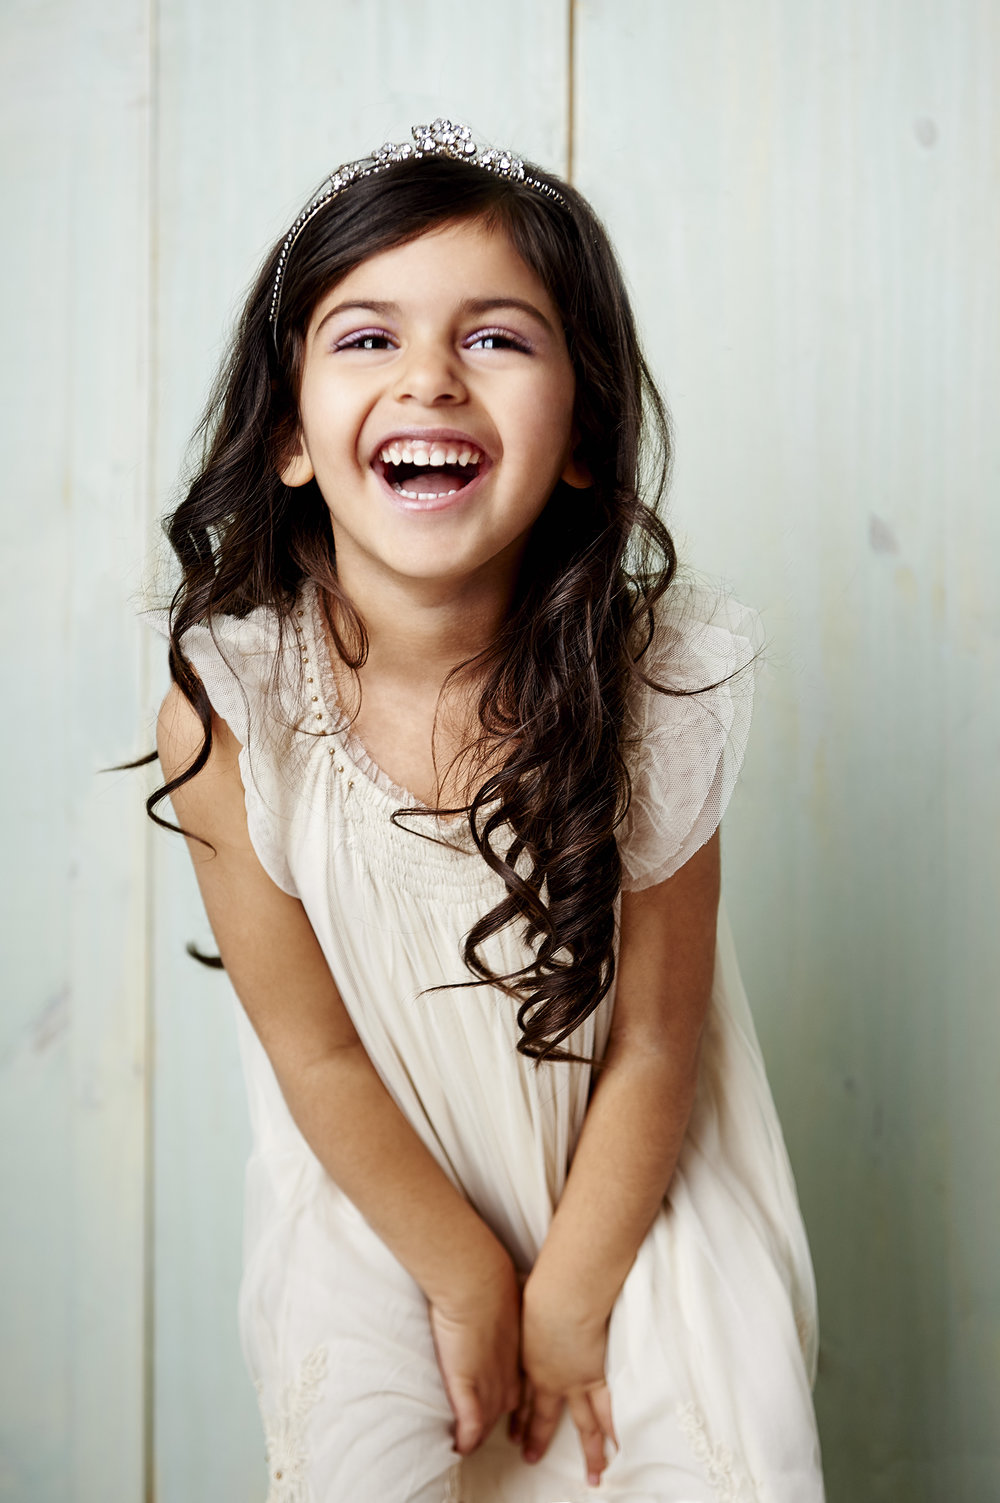 Marta-Hewson-Classical-portrait-young-girl-tiara-laughing.jpg